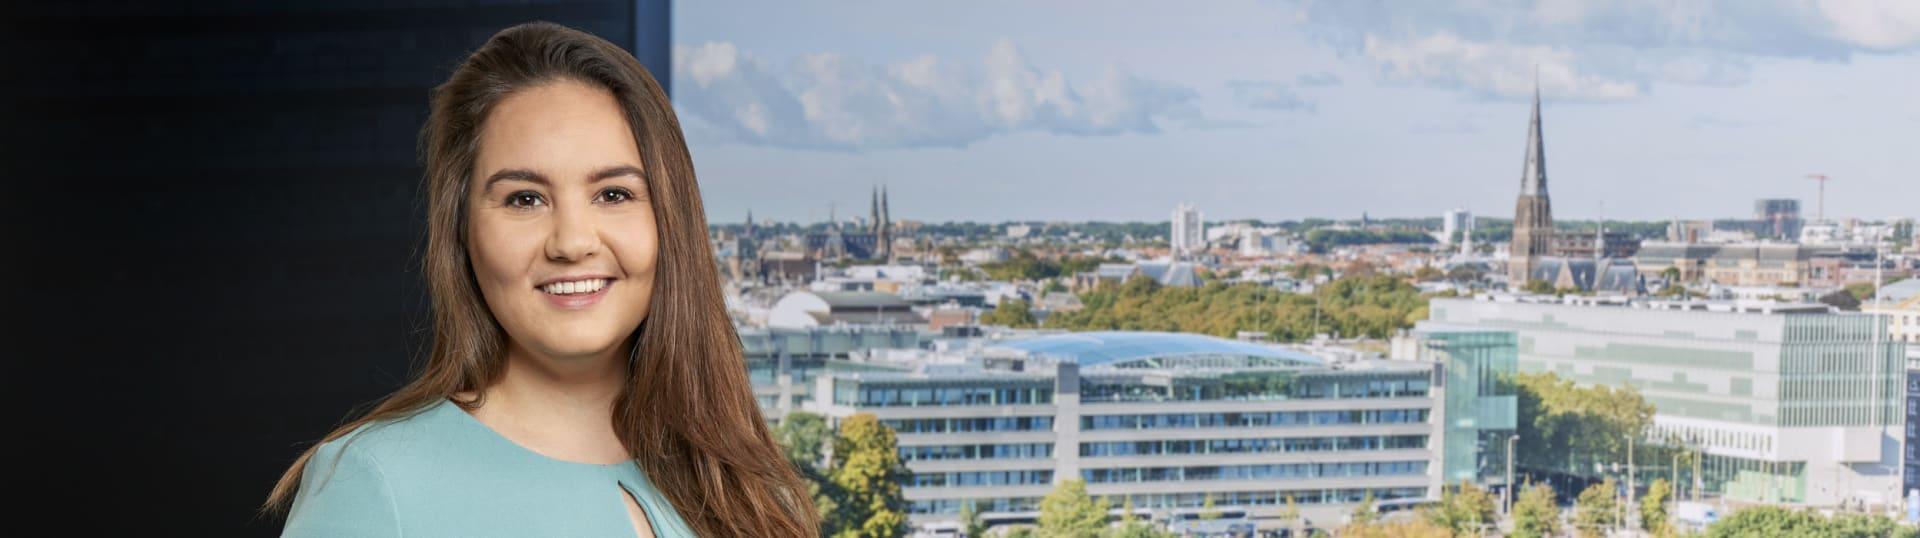 Caroline Boissevain, advocaat Pels Rijcken